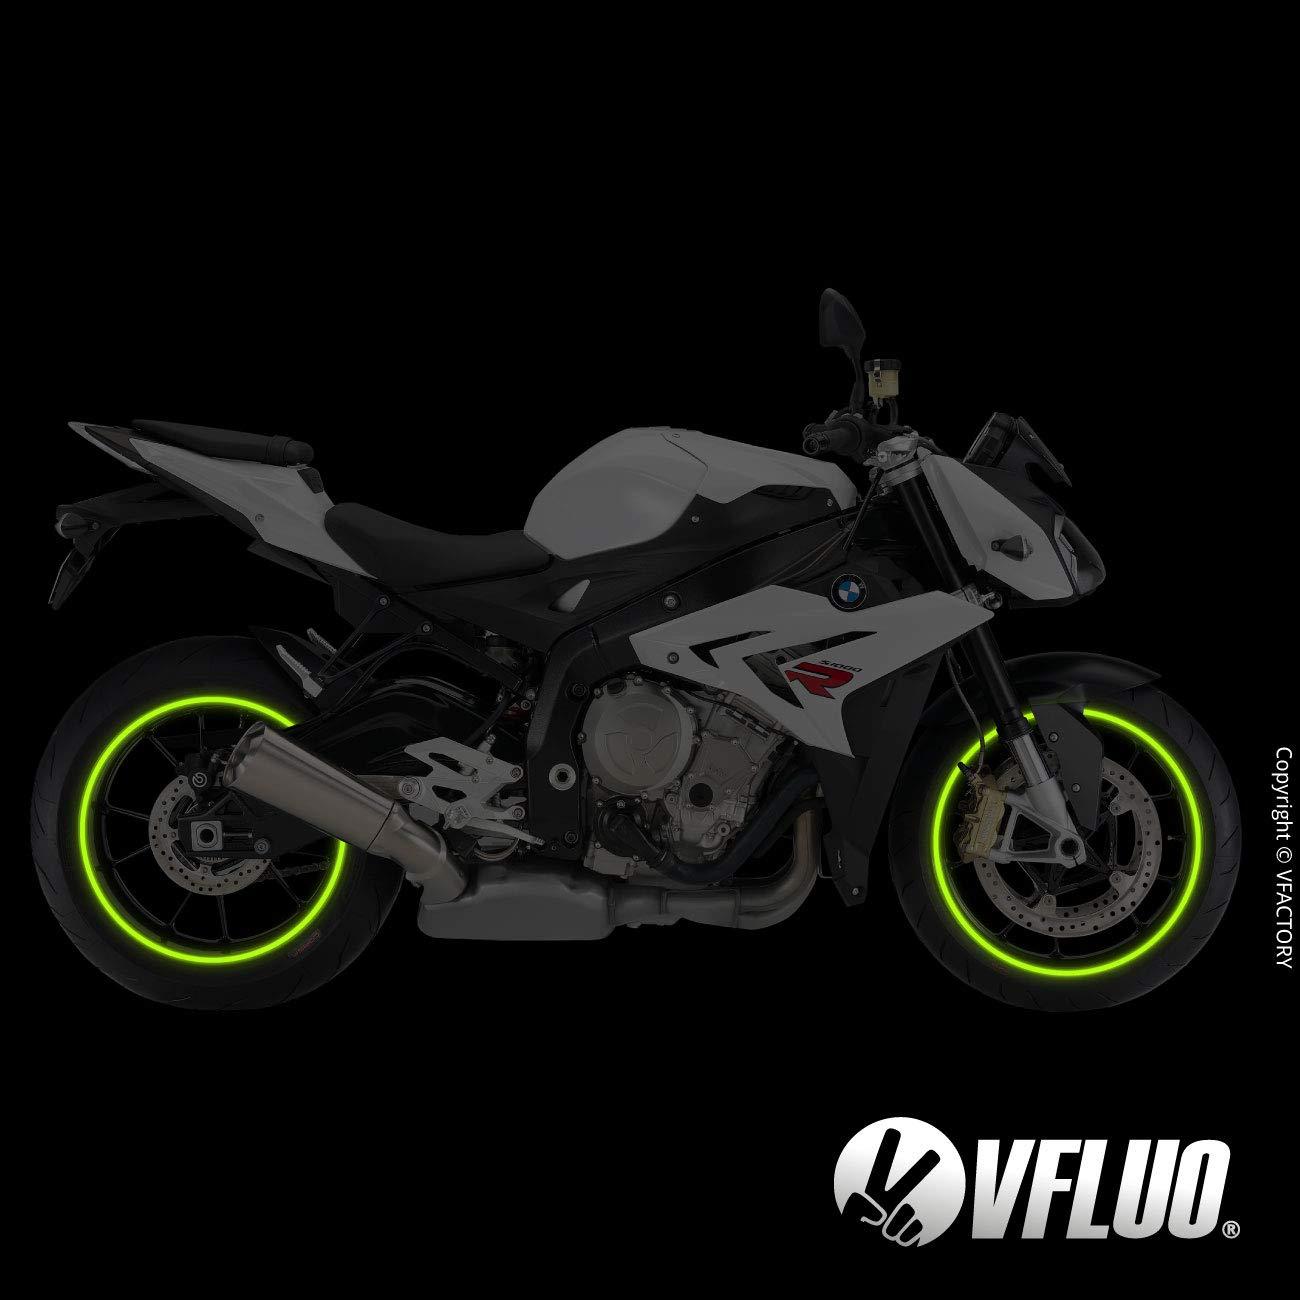 3M Technology/™ 7 mm width motorcycle retro reflective wheel stripes kit Dark blue 1 wheel VFLUO CIRCULAR/™